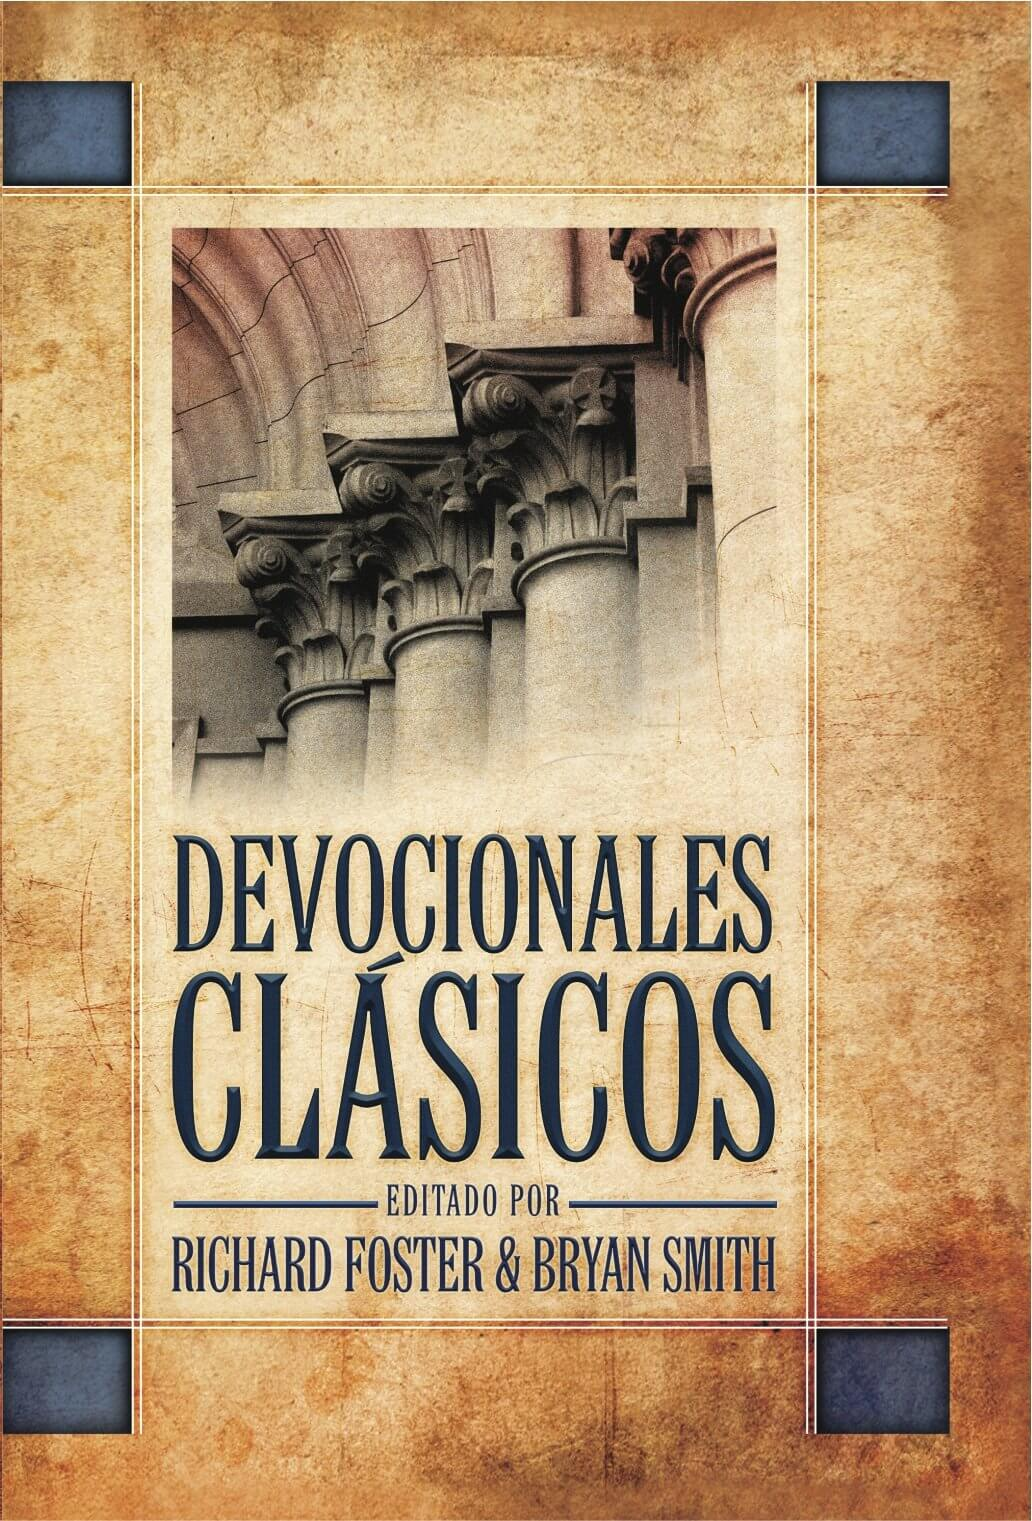 DEVOCIONALES CLASICOS